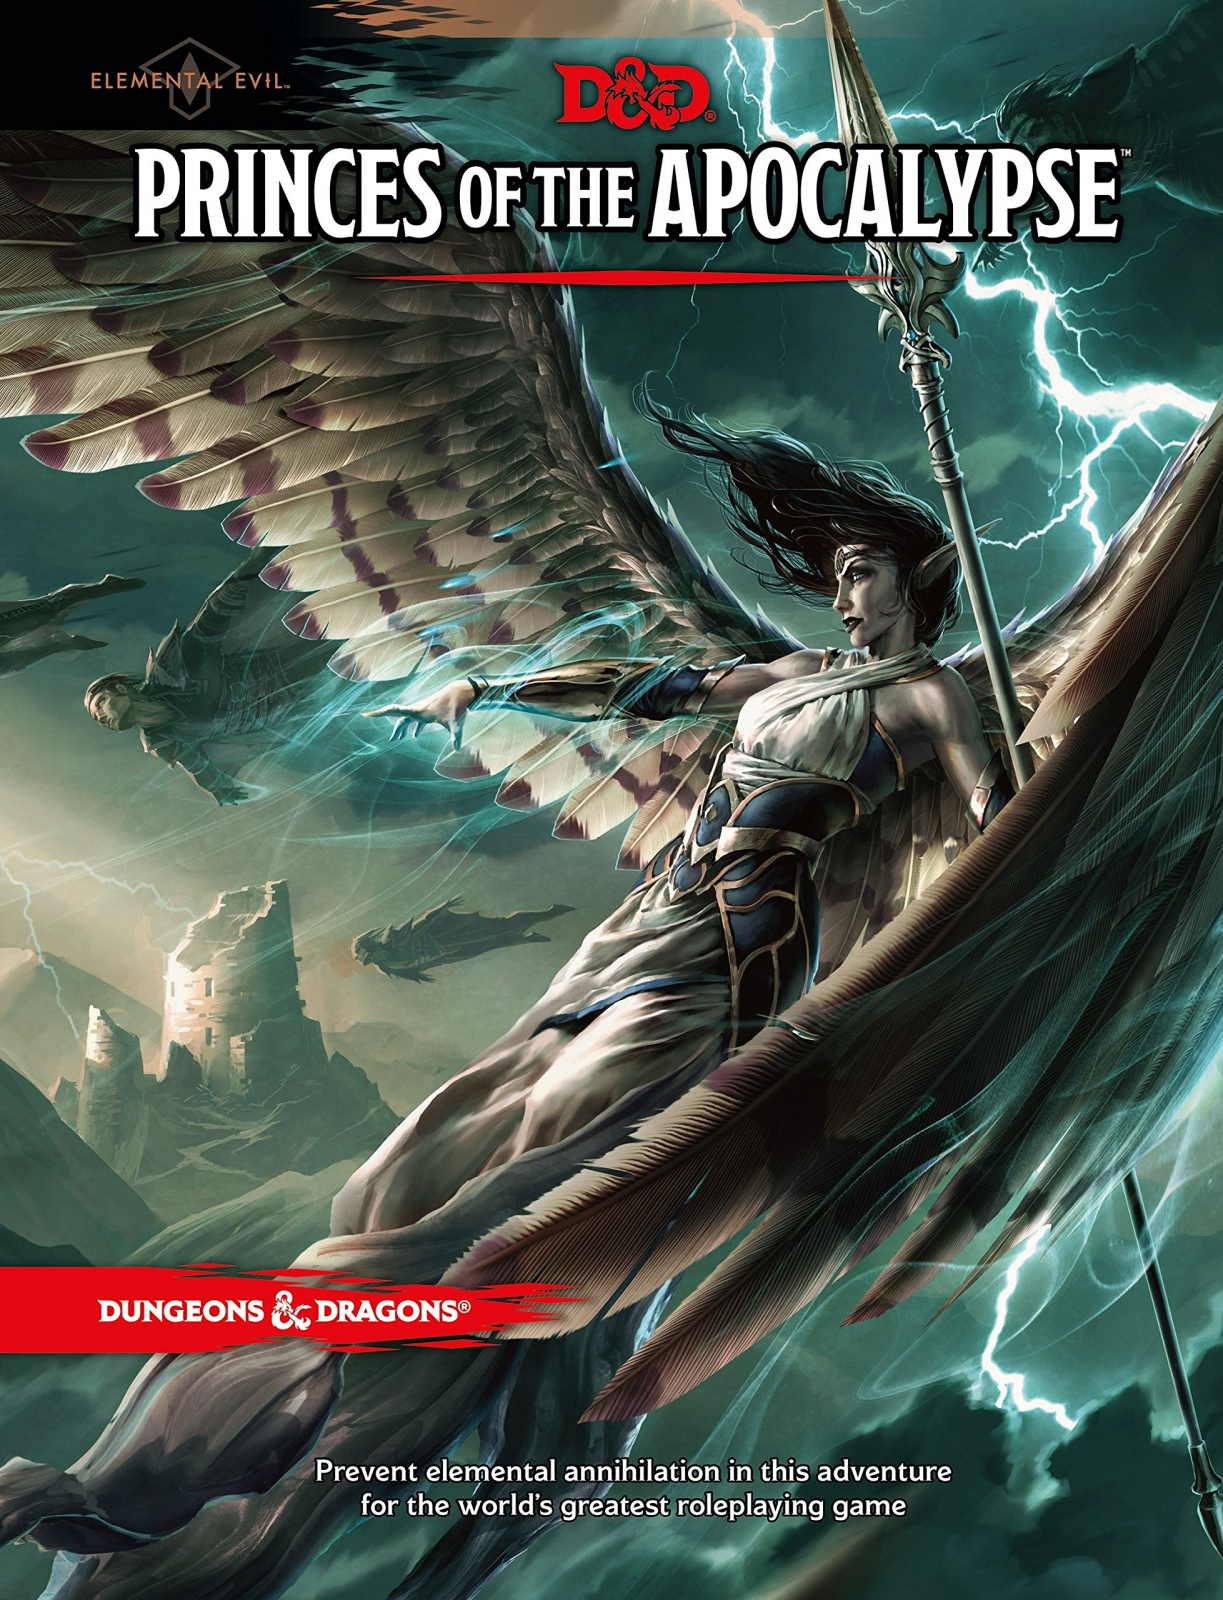 DD Adventure - Princes of the Apocalypse